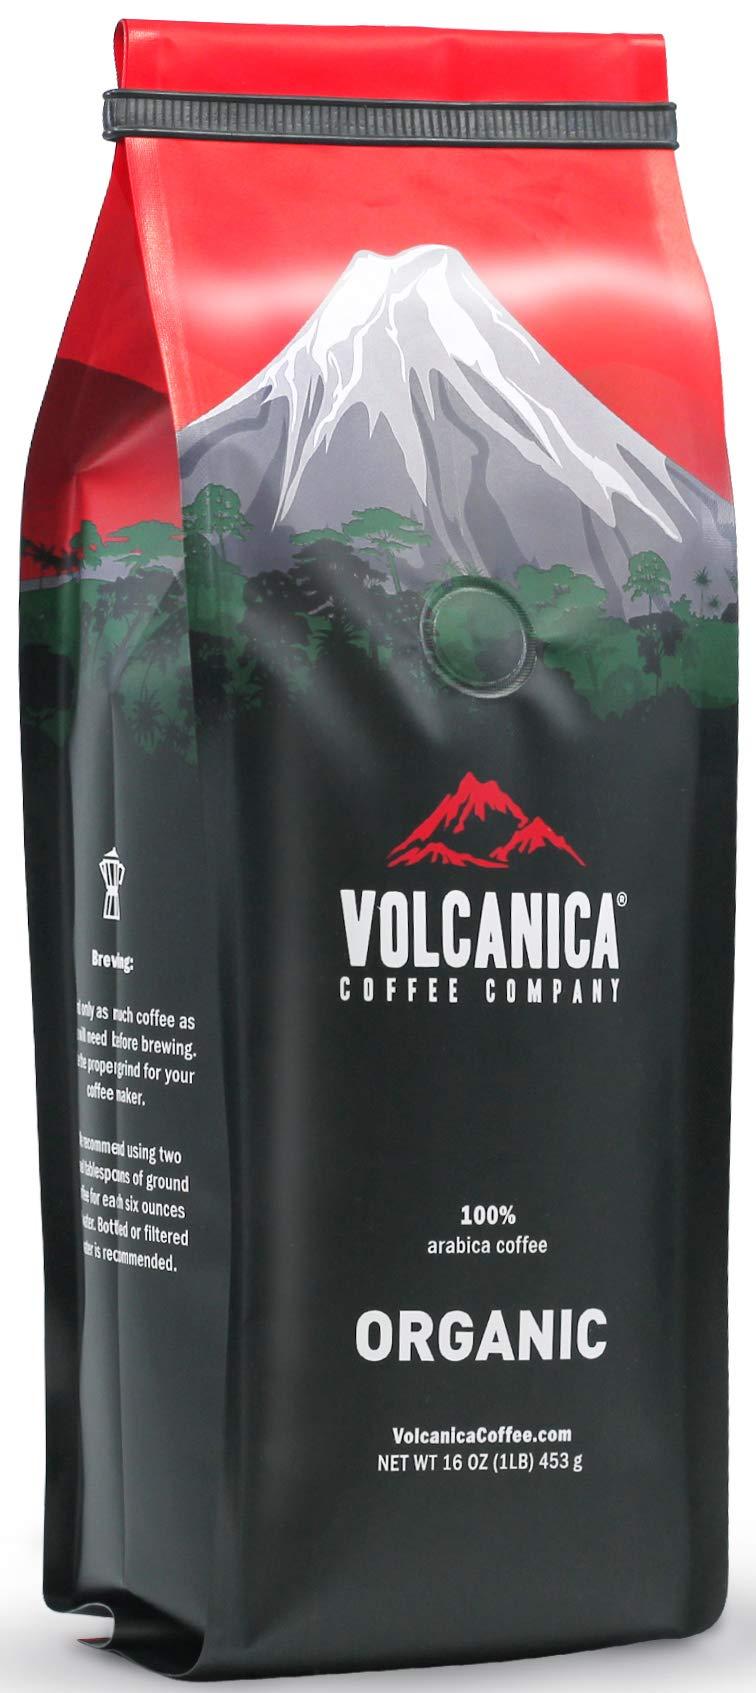 Nicaragua Coffee, Organic, Matagalpa Region, Ground, Fresh Roasted, 16-Ounce